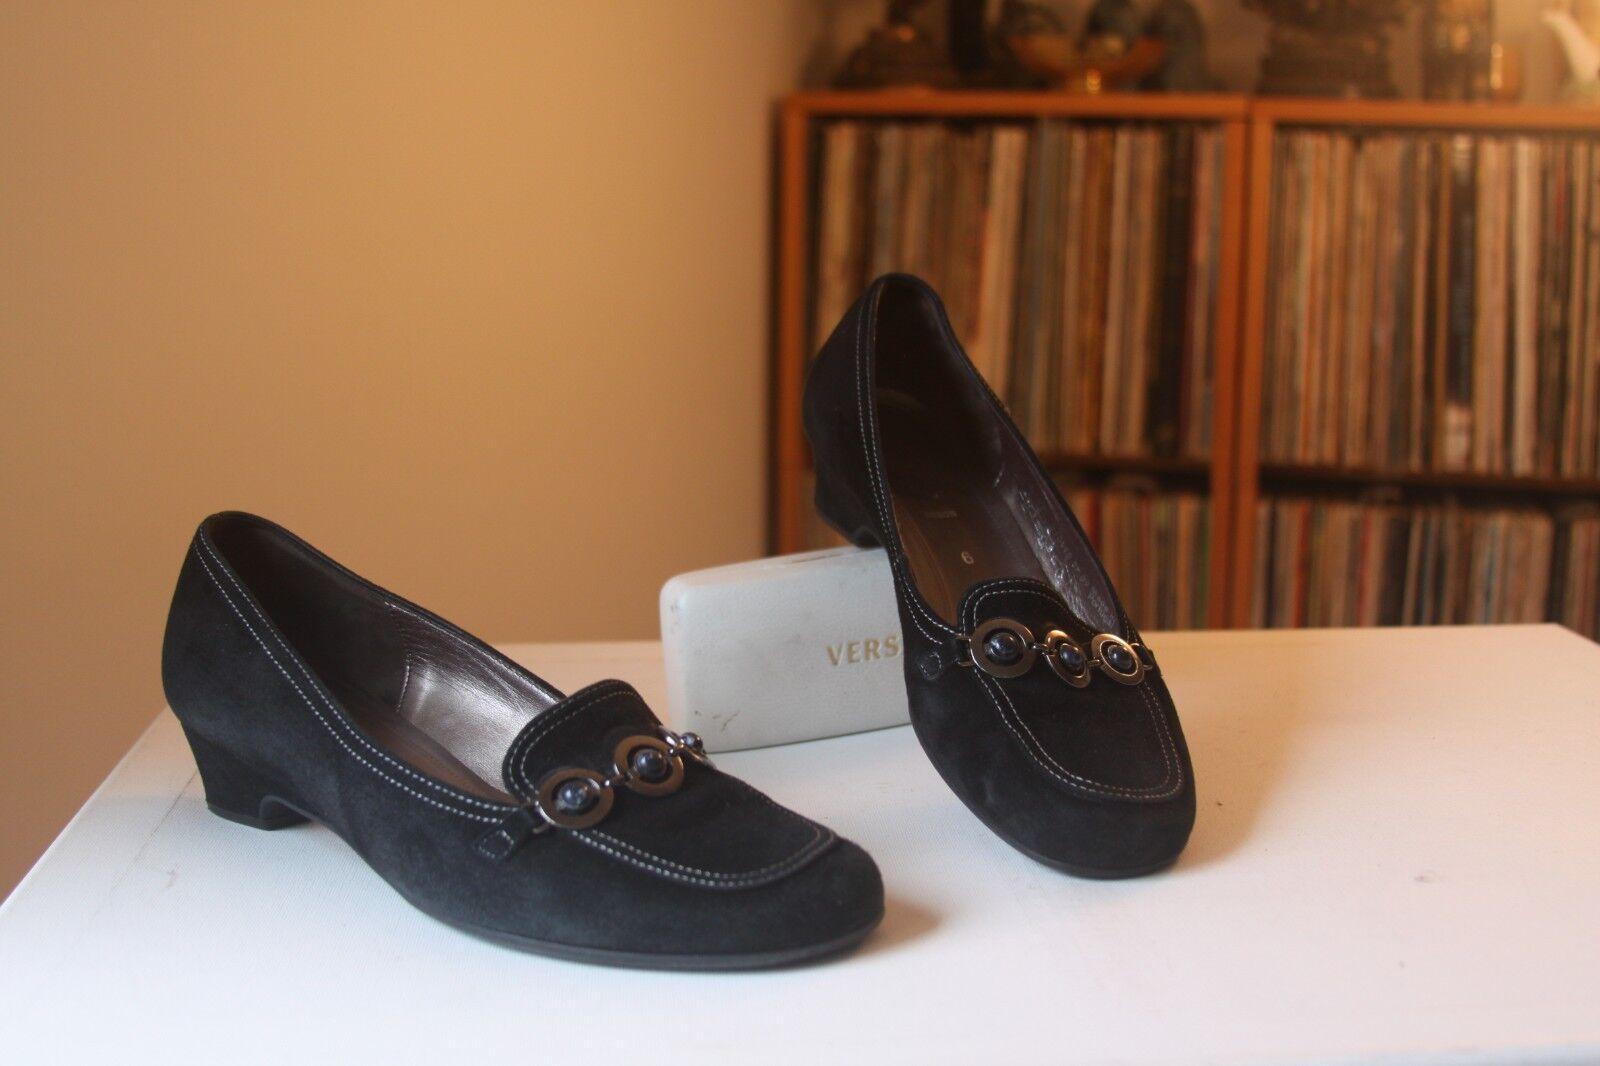 Gabor Fashion Black Suede 1 3 8 Inch Heel Loafers Pumps UK SZ 6 US SZ 8.5 Appx.